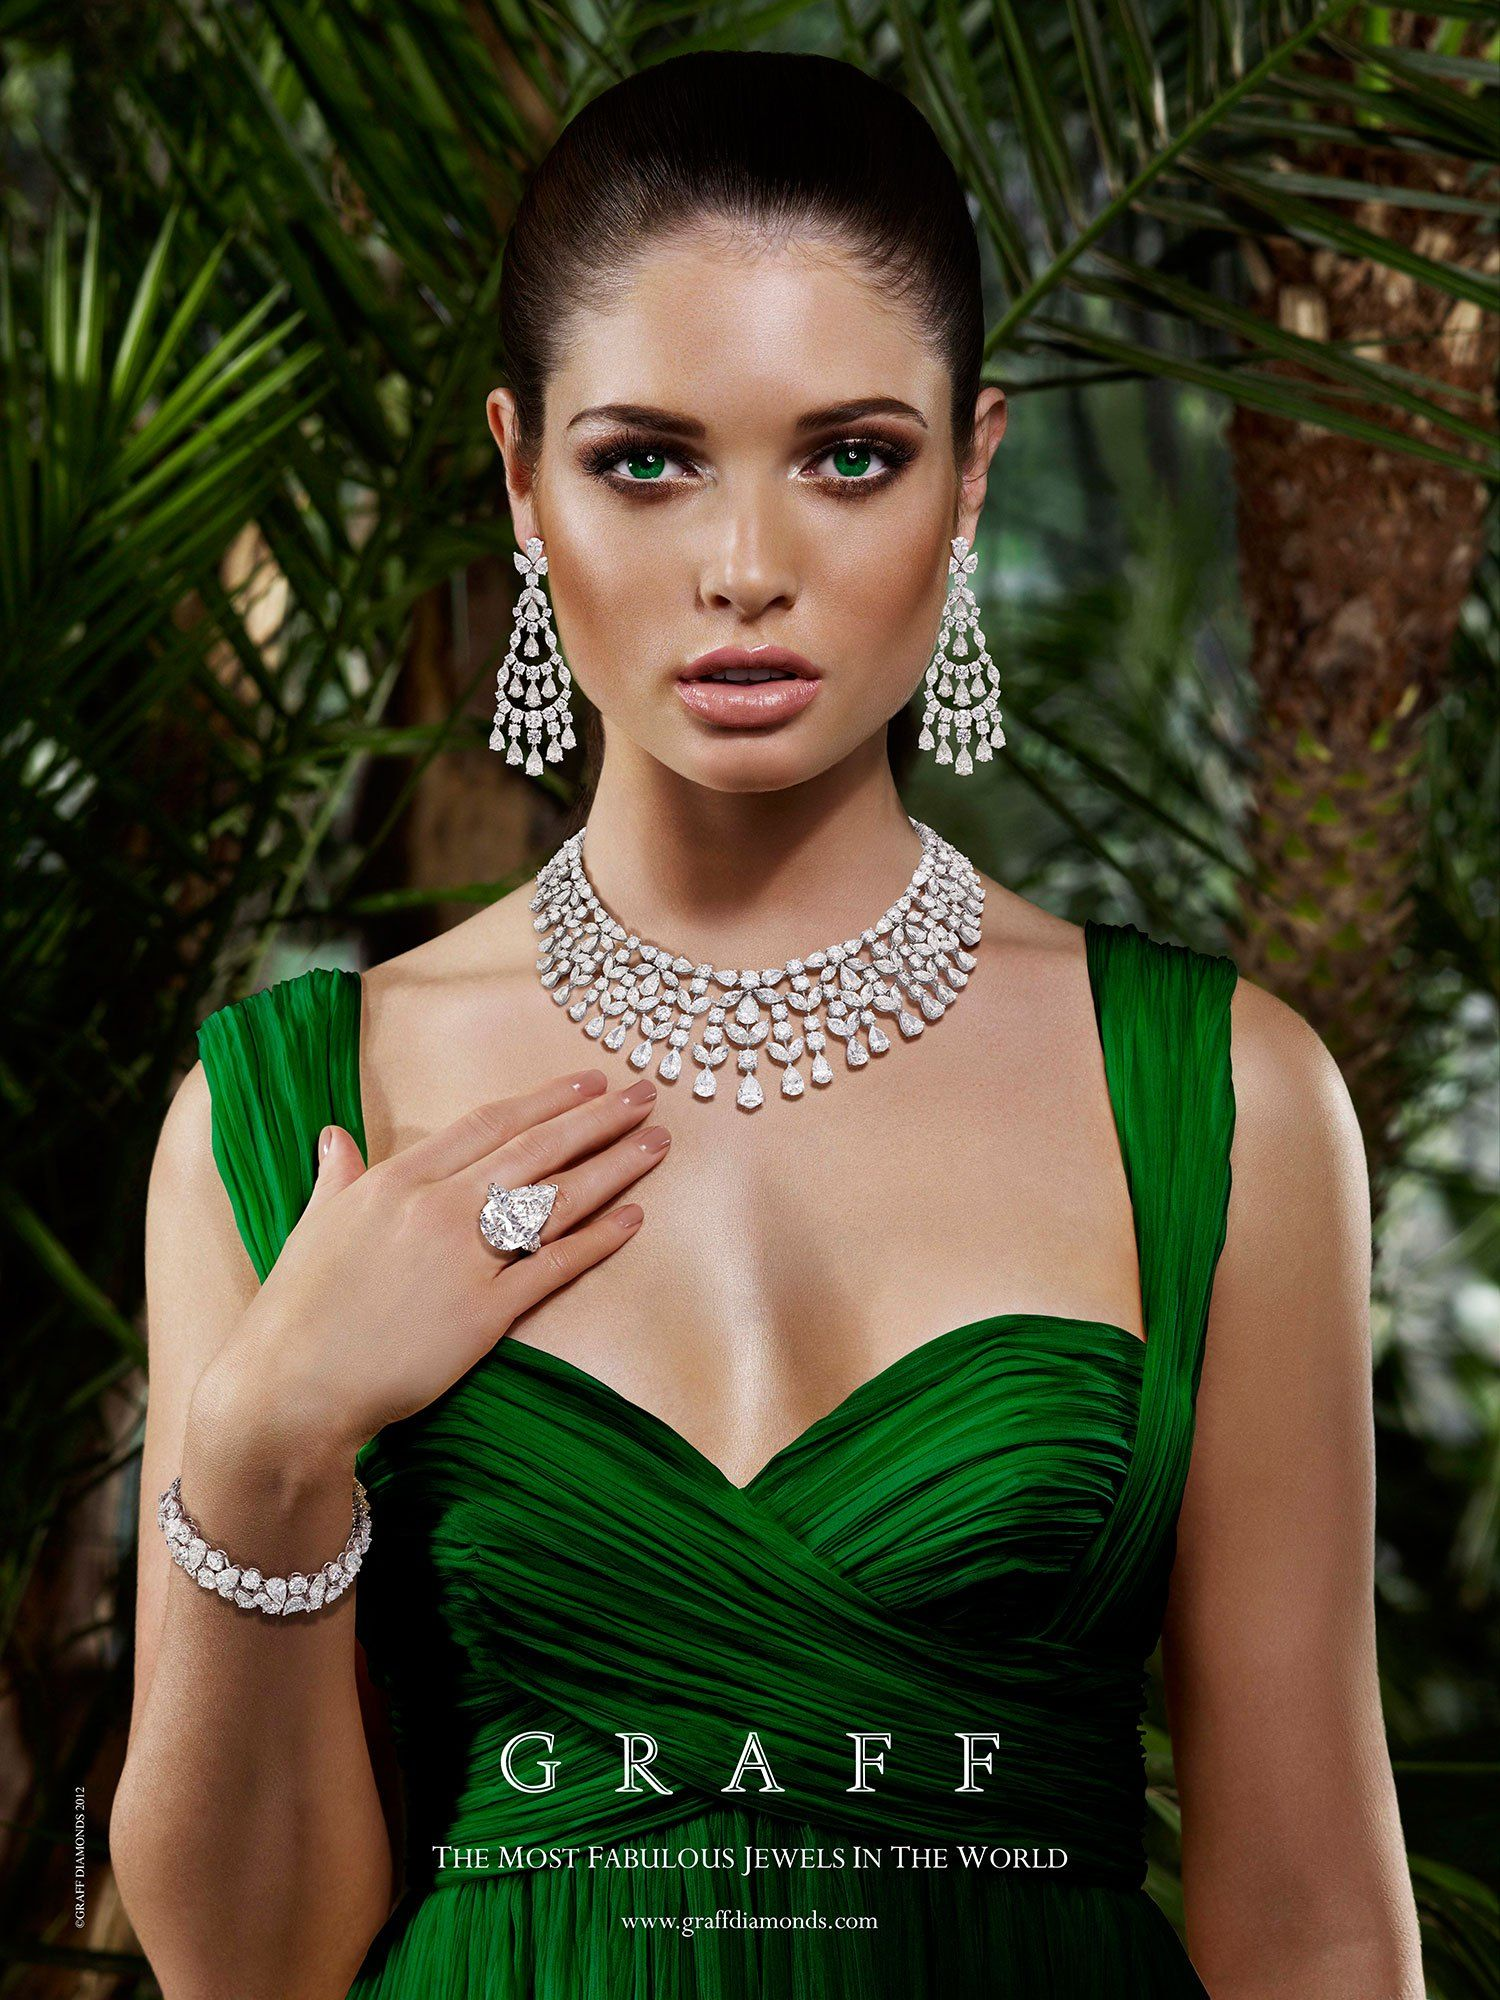 24+ High end luxury jewelry brands info